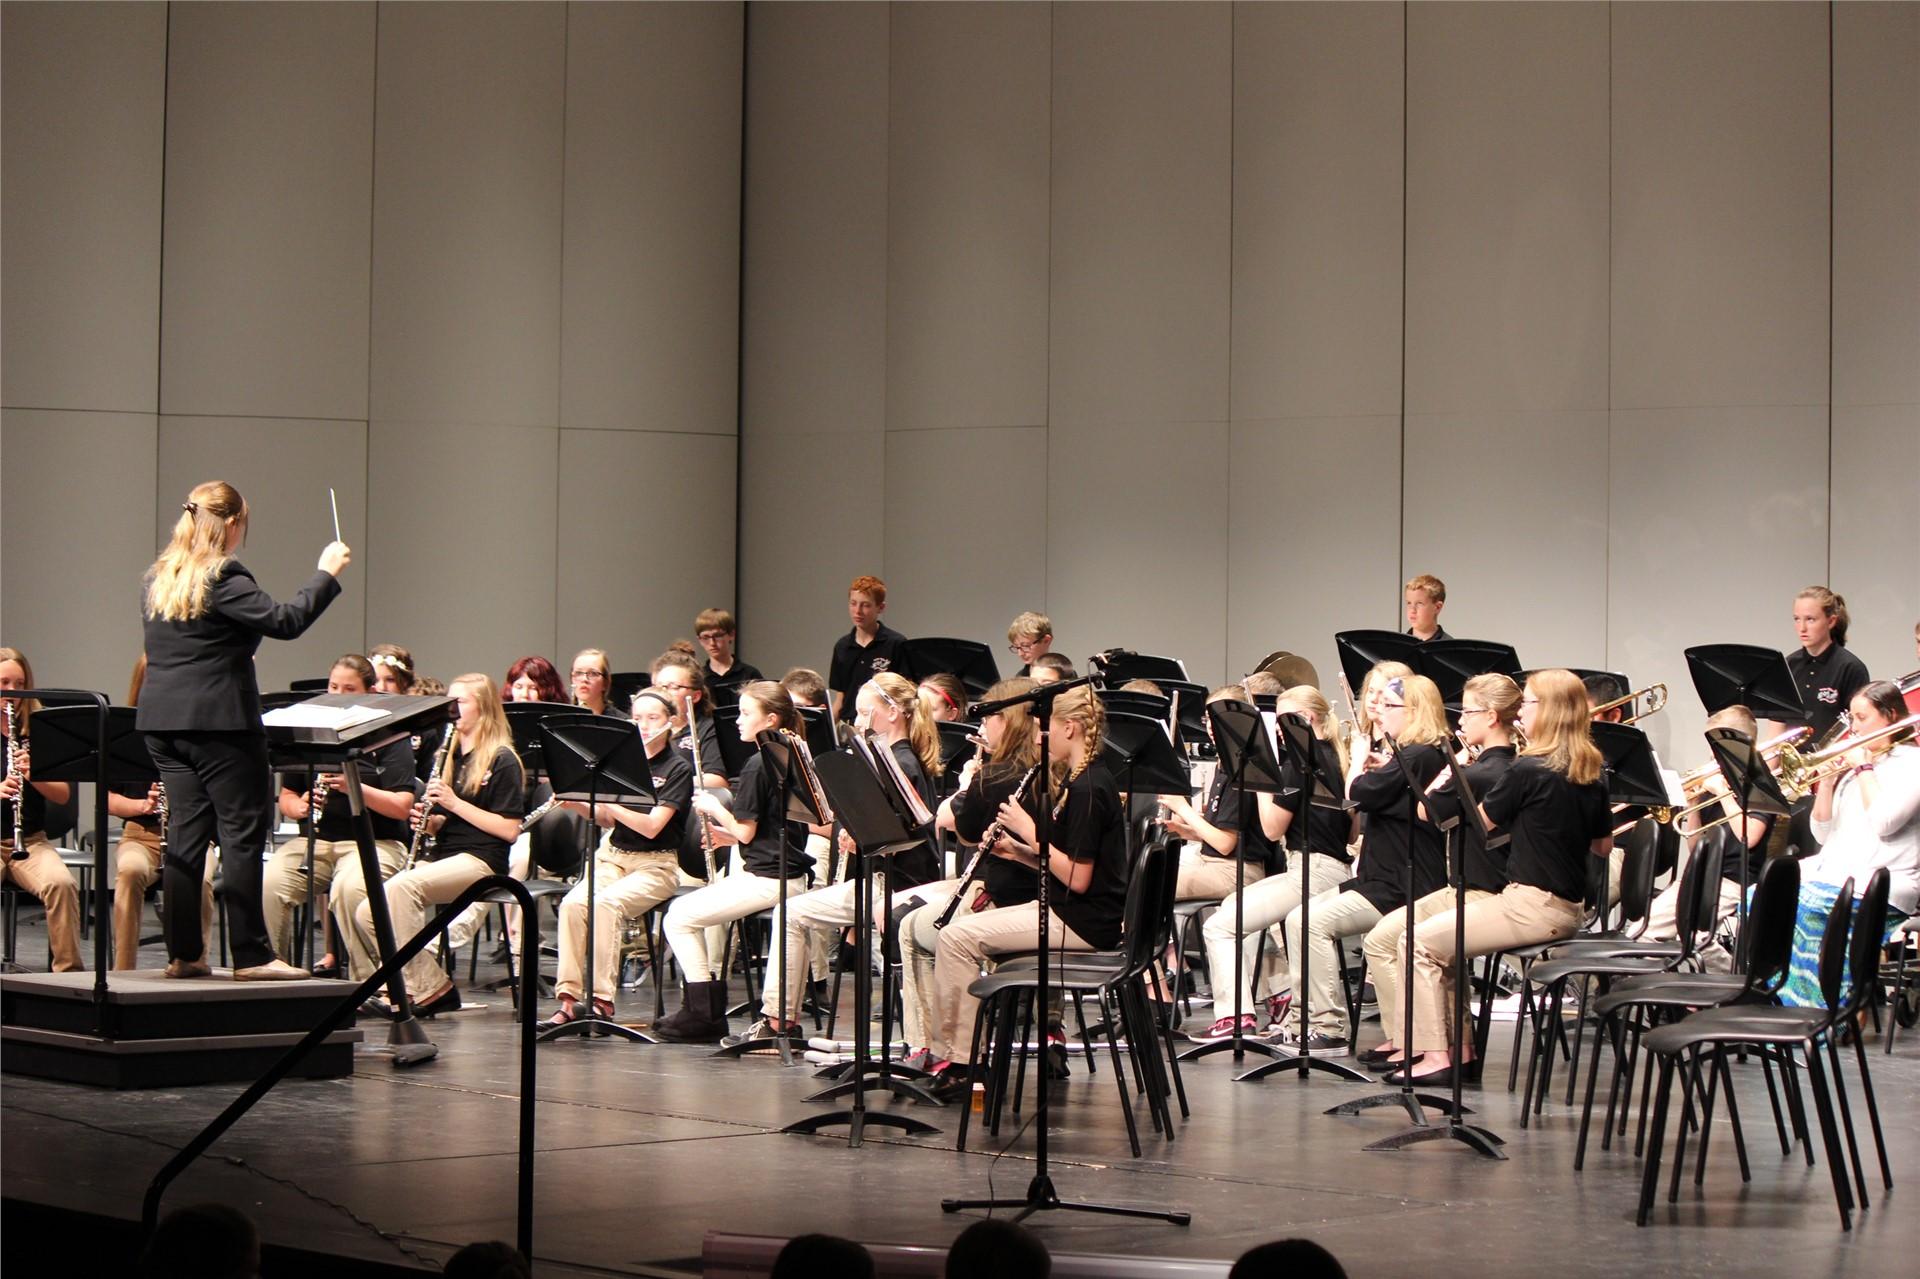 7th grade band, spring 2016